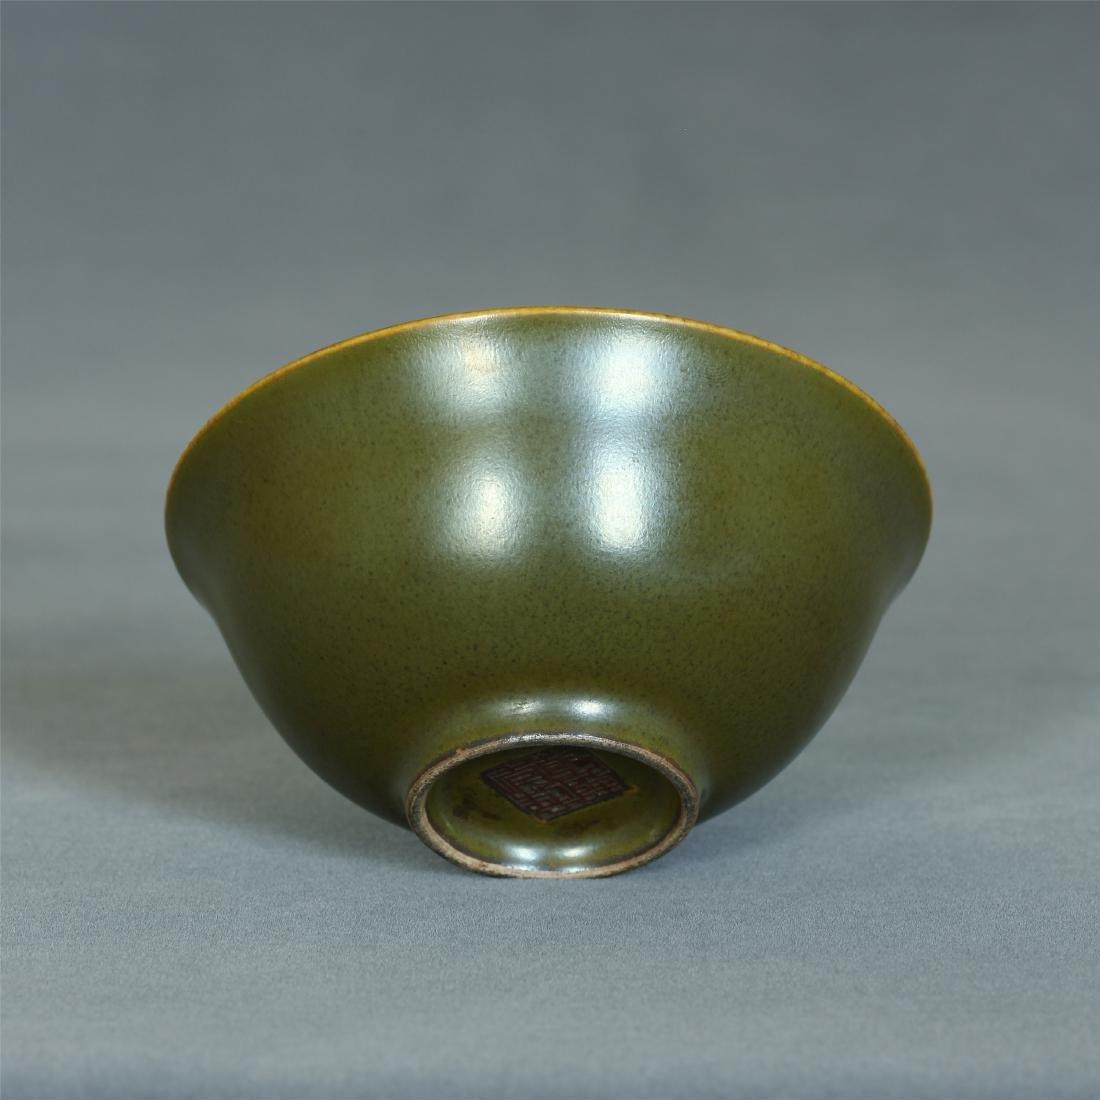 Tea glaze porcelain small bowl of Qing Dynasty QianLong - 4